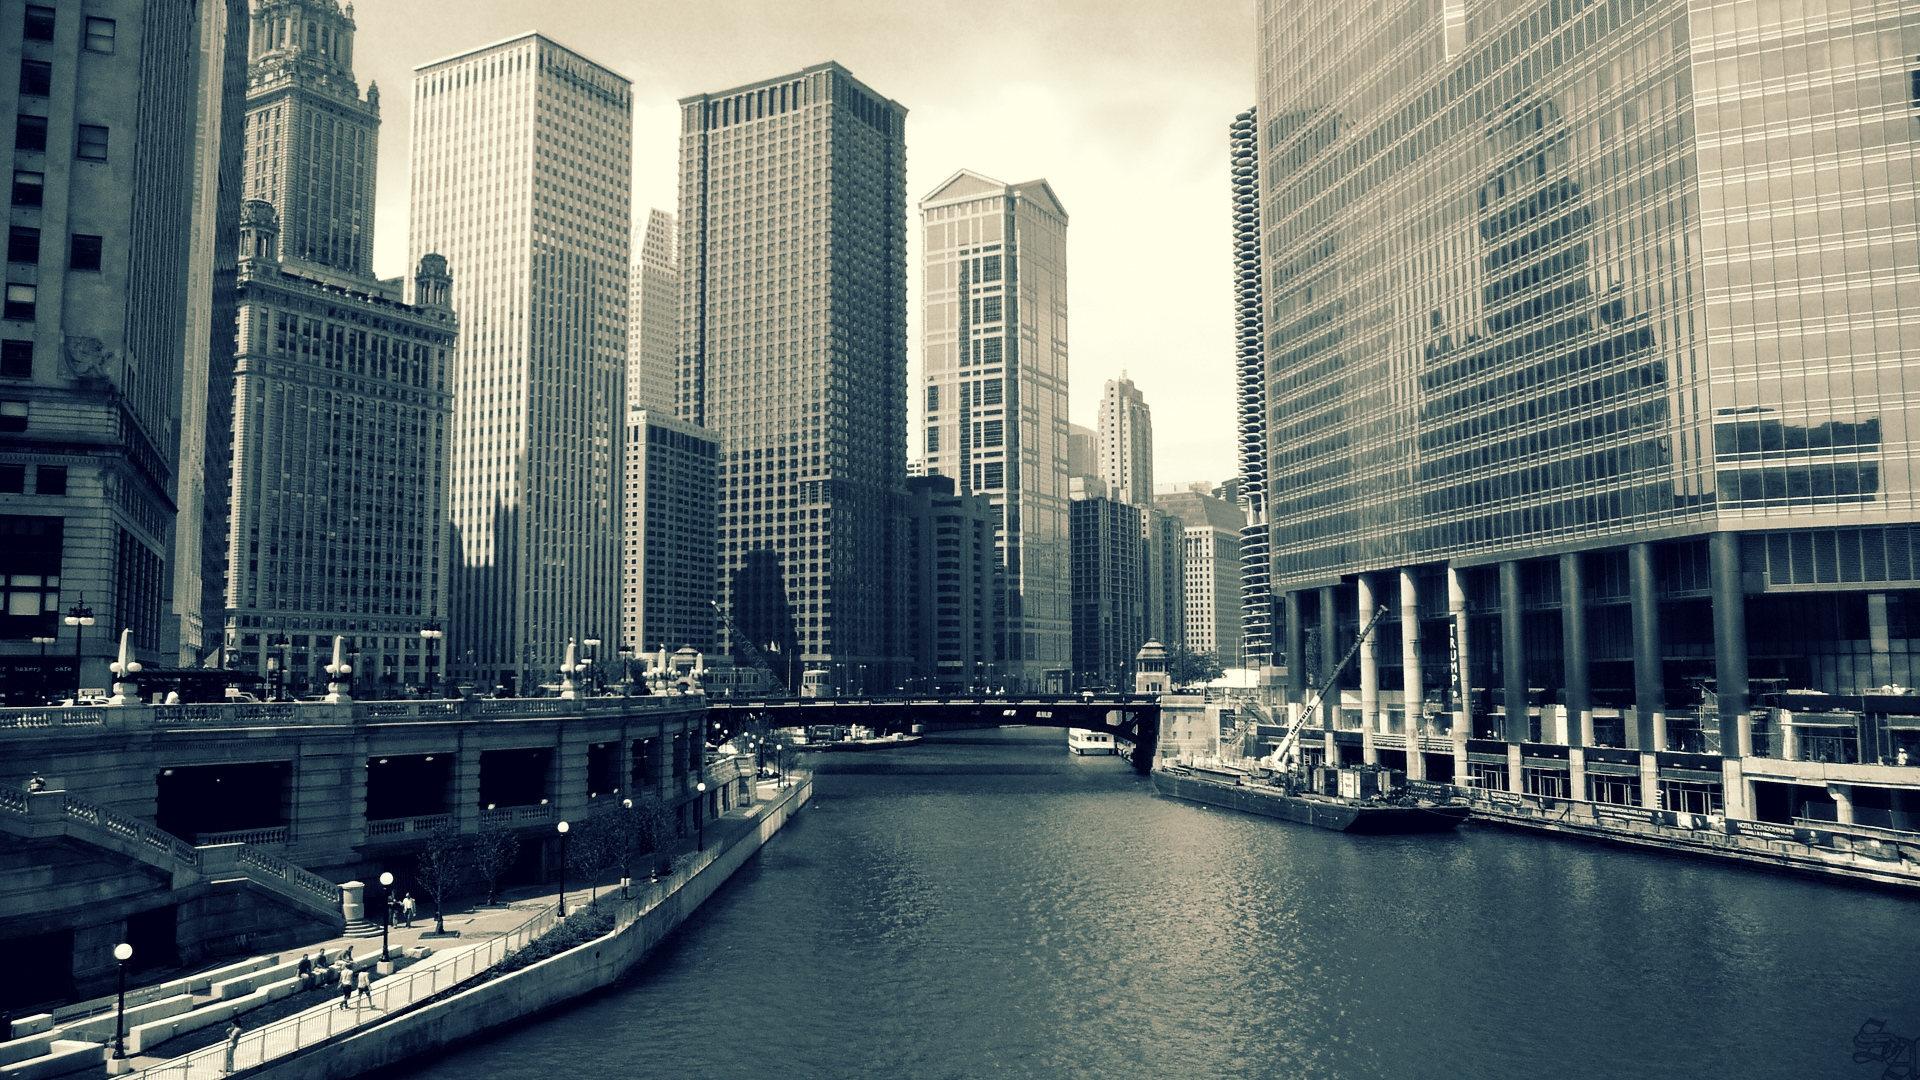 chicago 1080